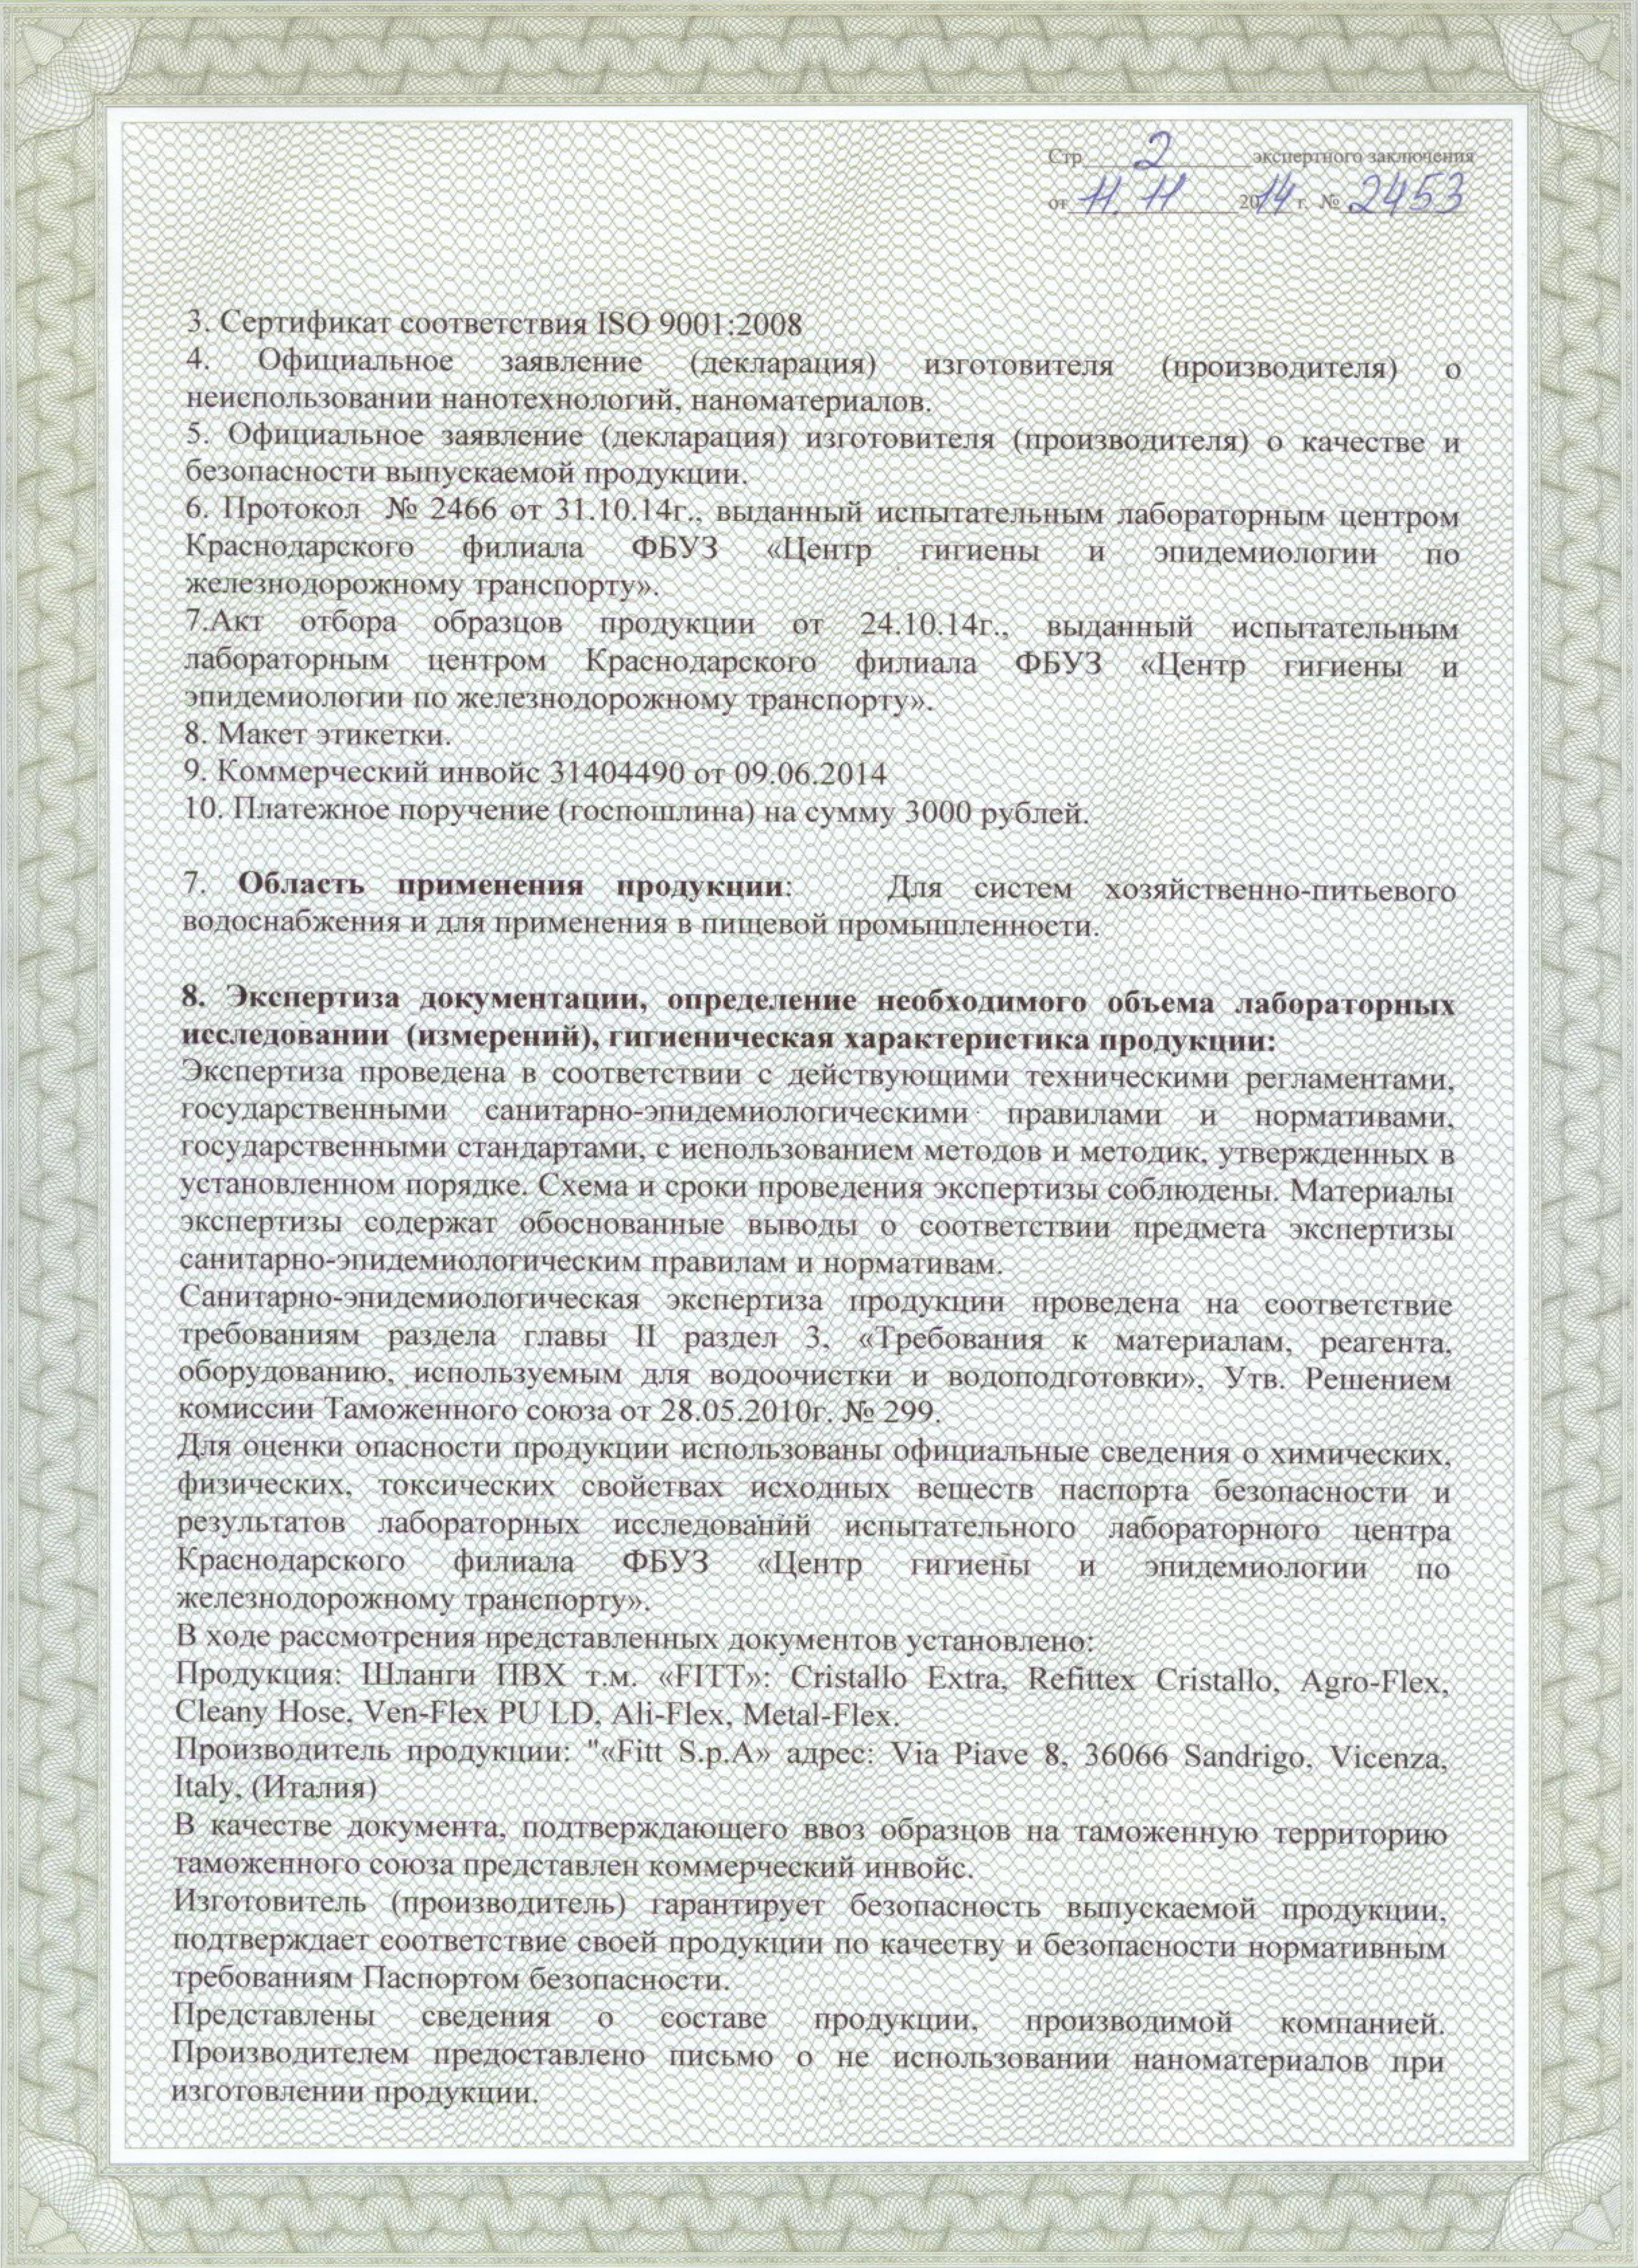 State_registration_Certificate_-_Russia-3.jpg